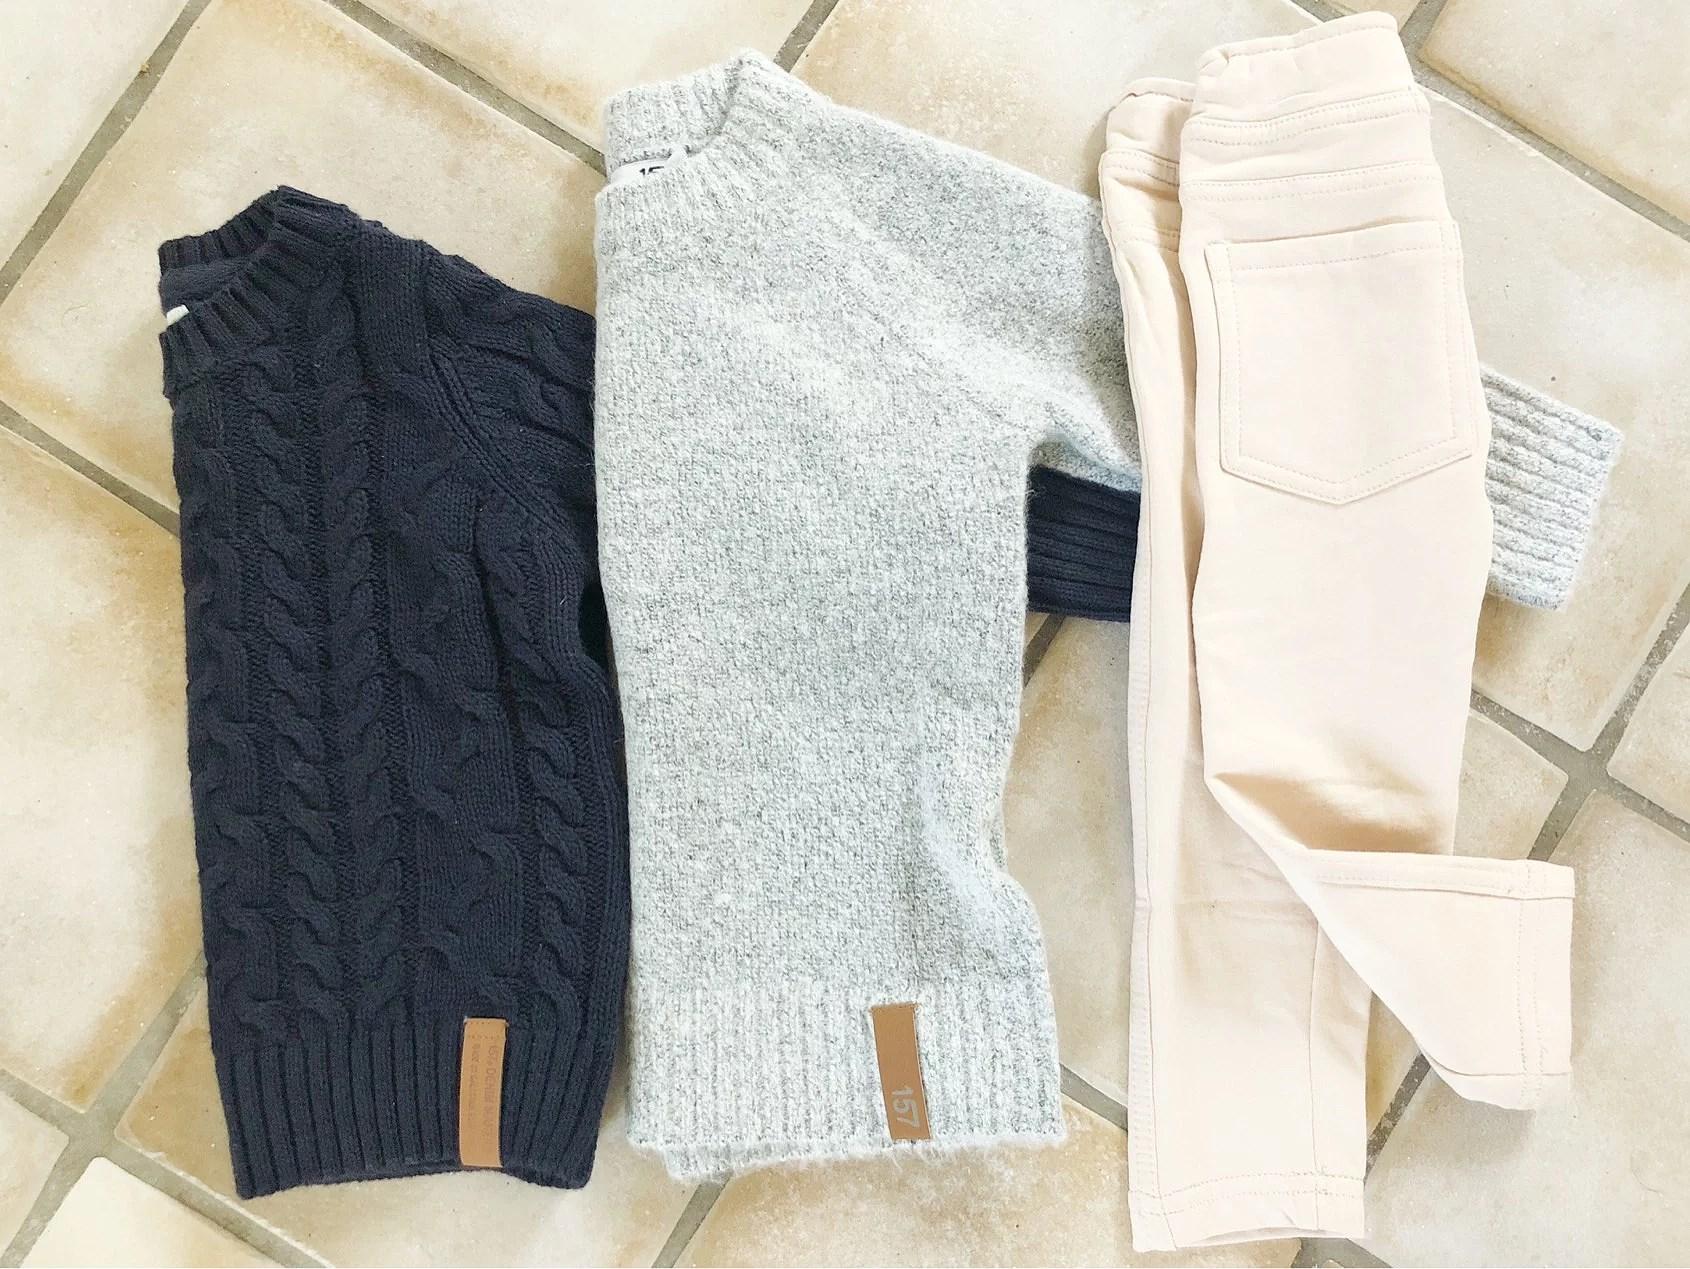 Nya kläder: Milla